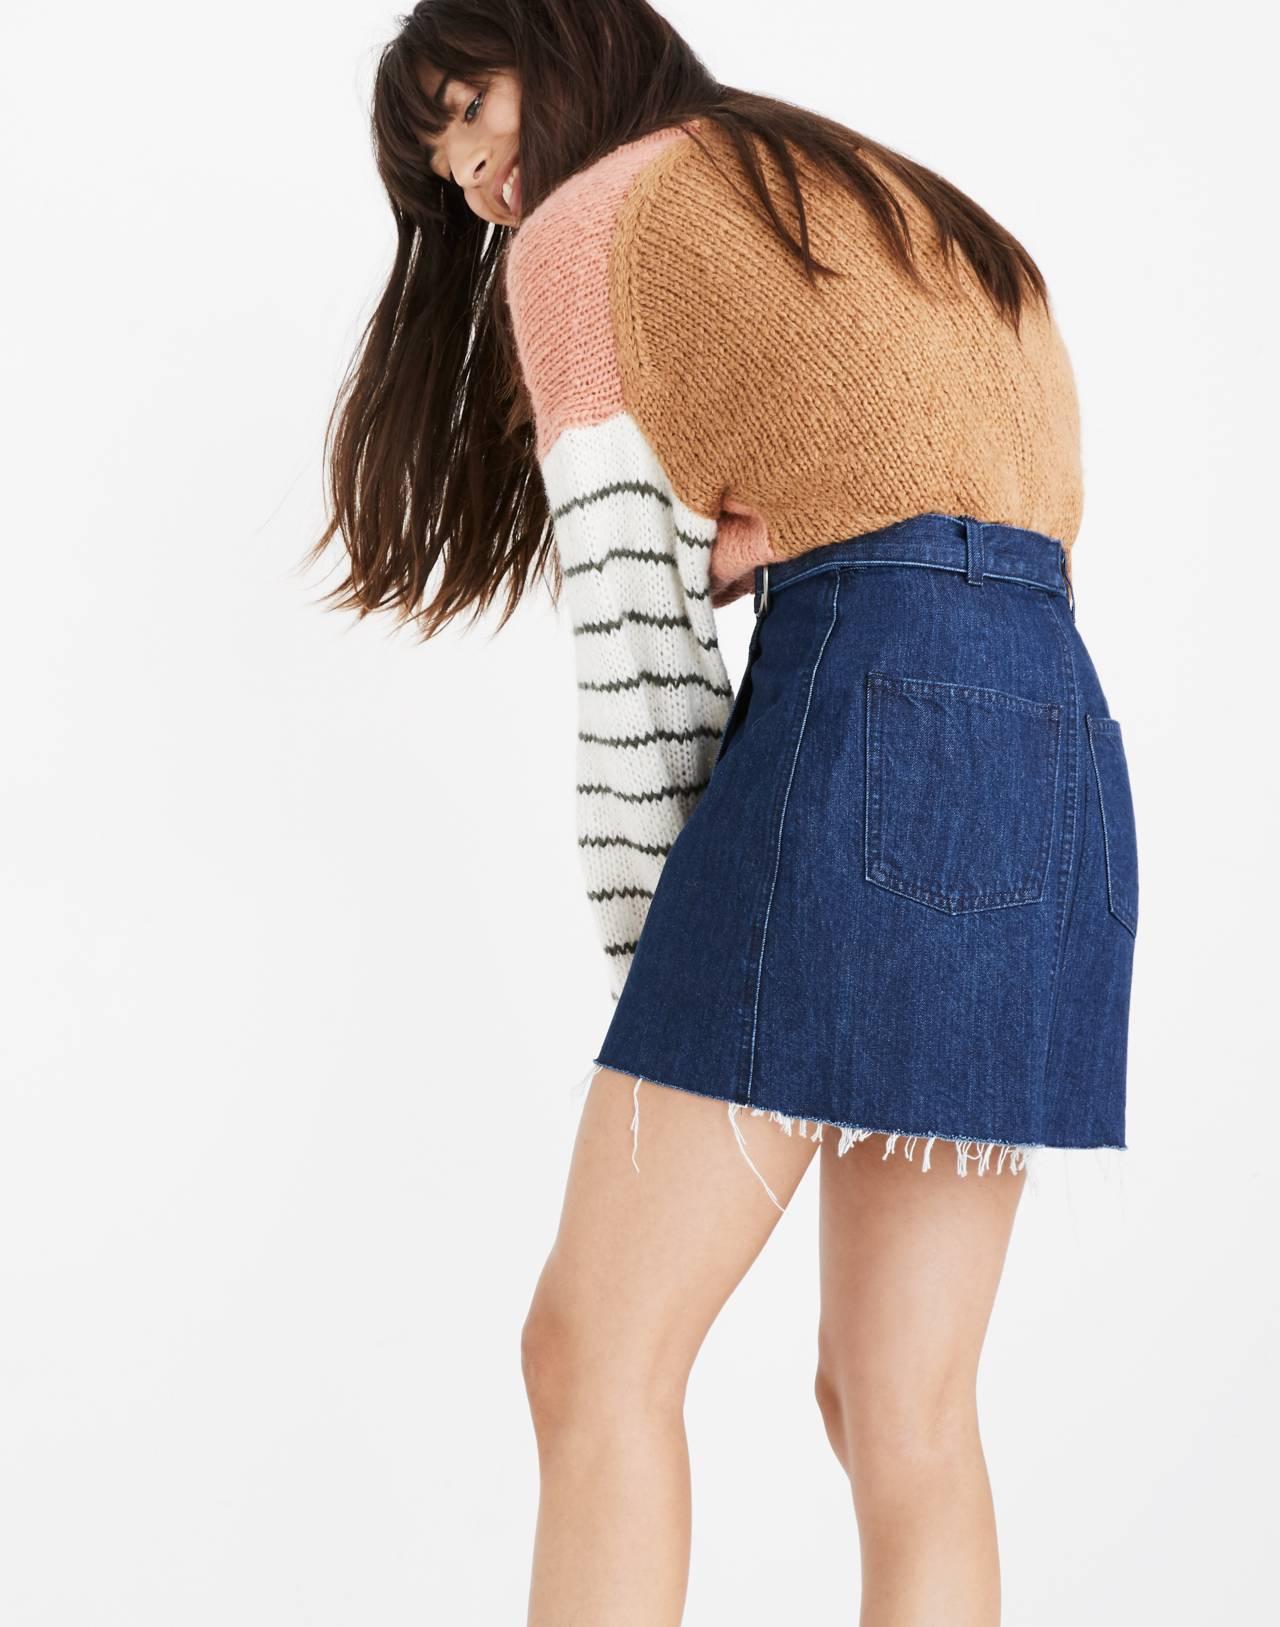 Denim Raw-Hem Mini Wrap Skirt in smithe wash image 3